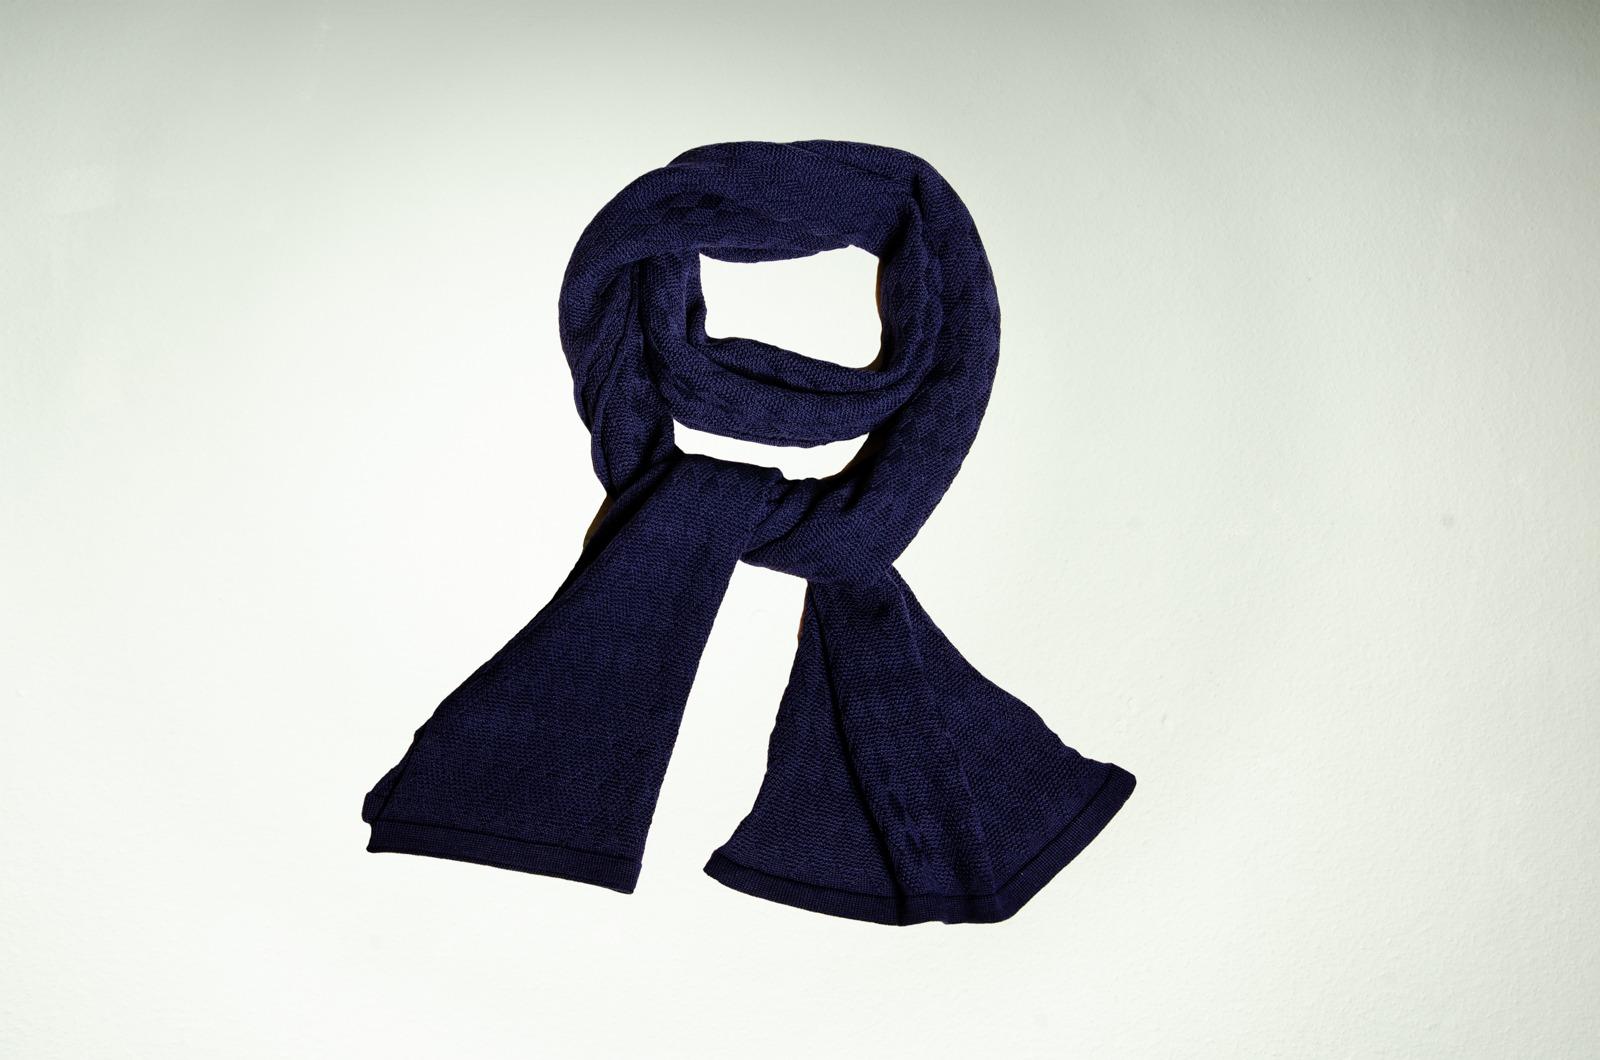 Merino Schal Weboptik einfarbig in dunkelblau